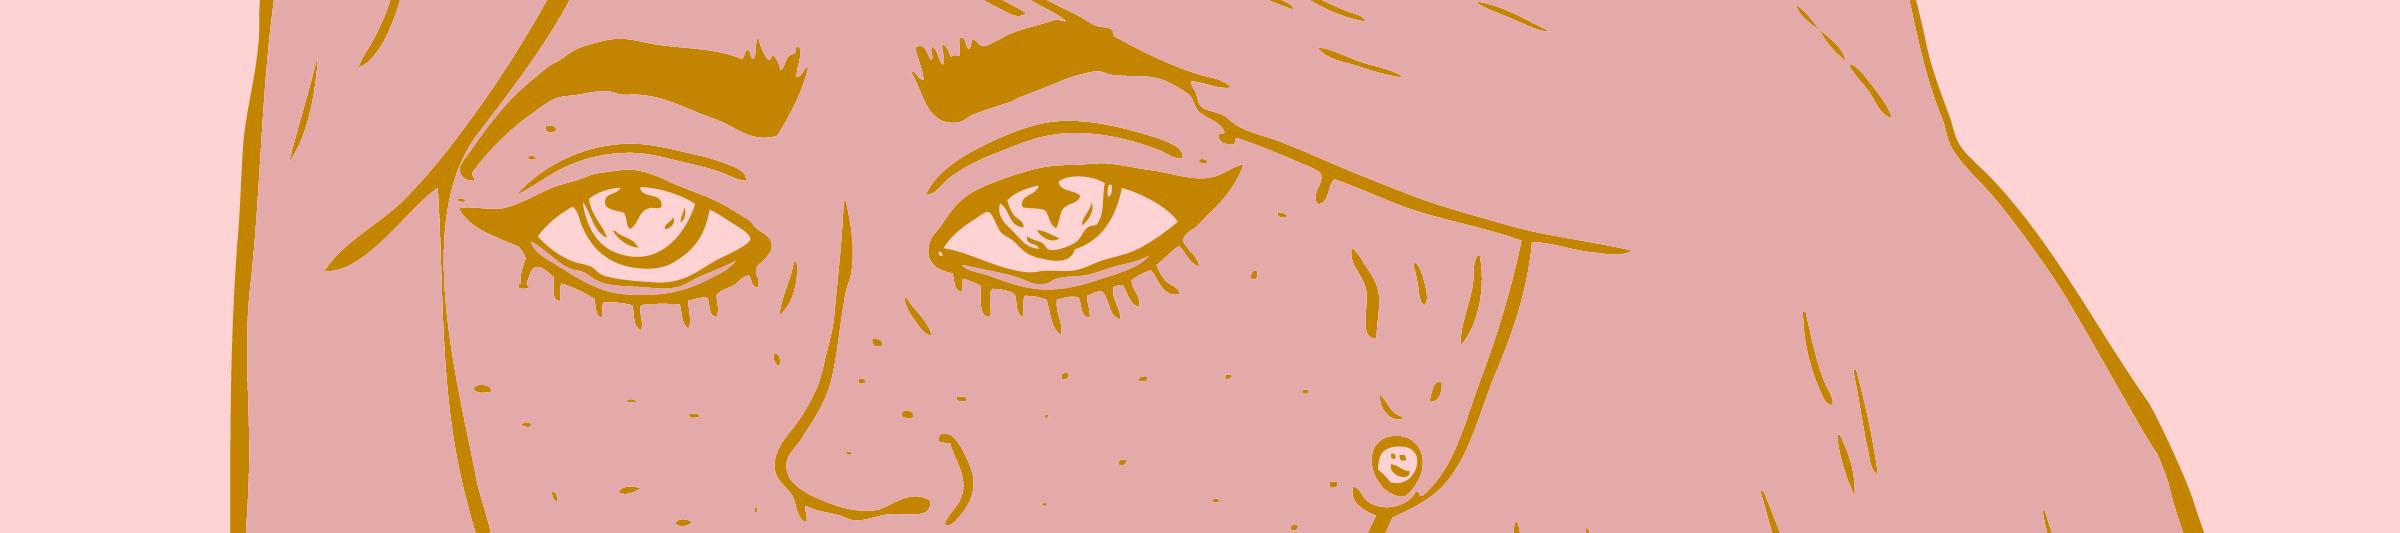 female illustrations -